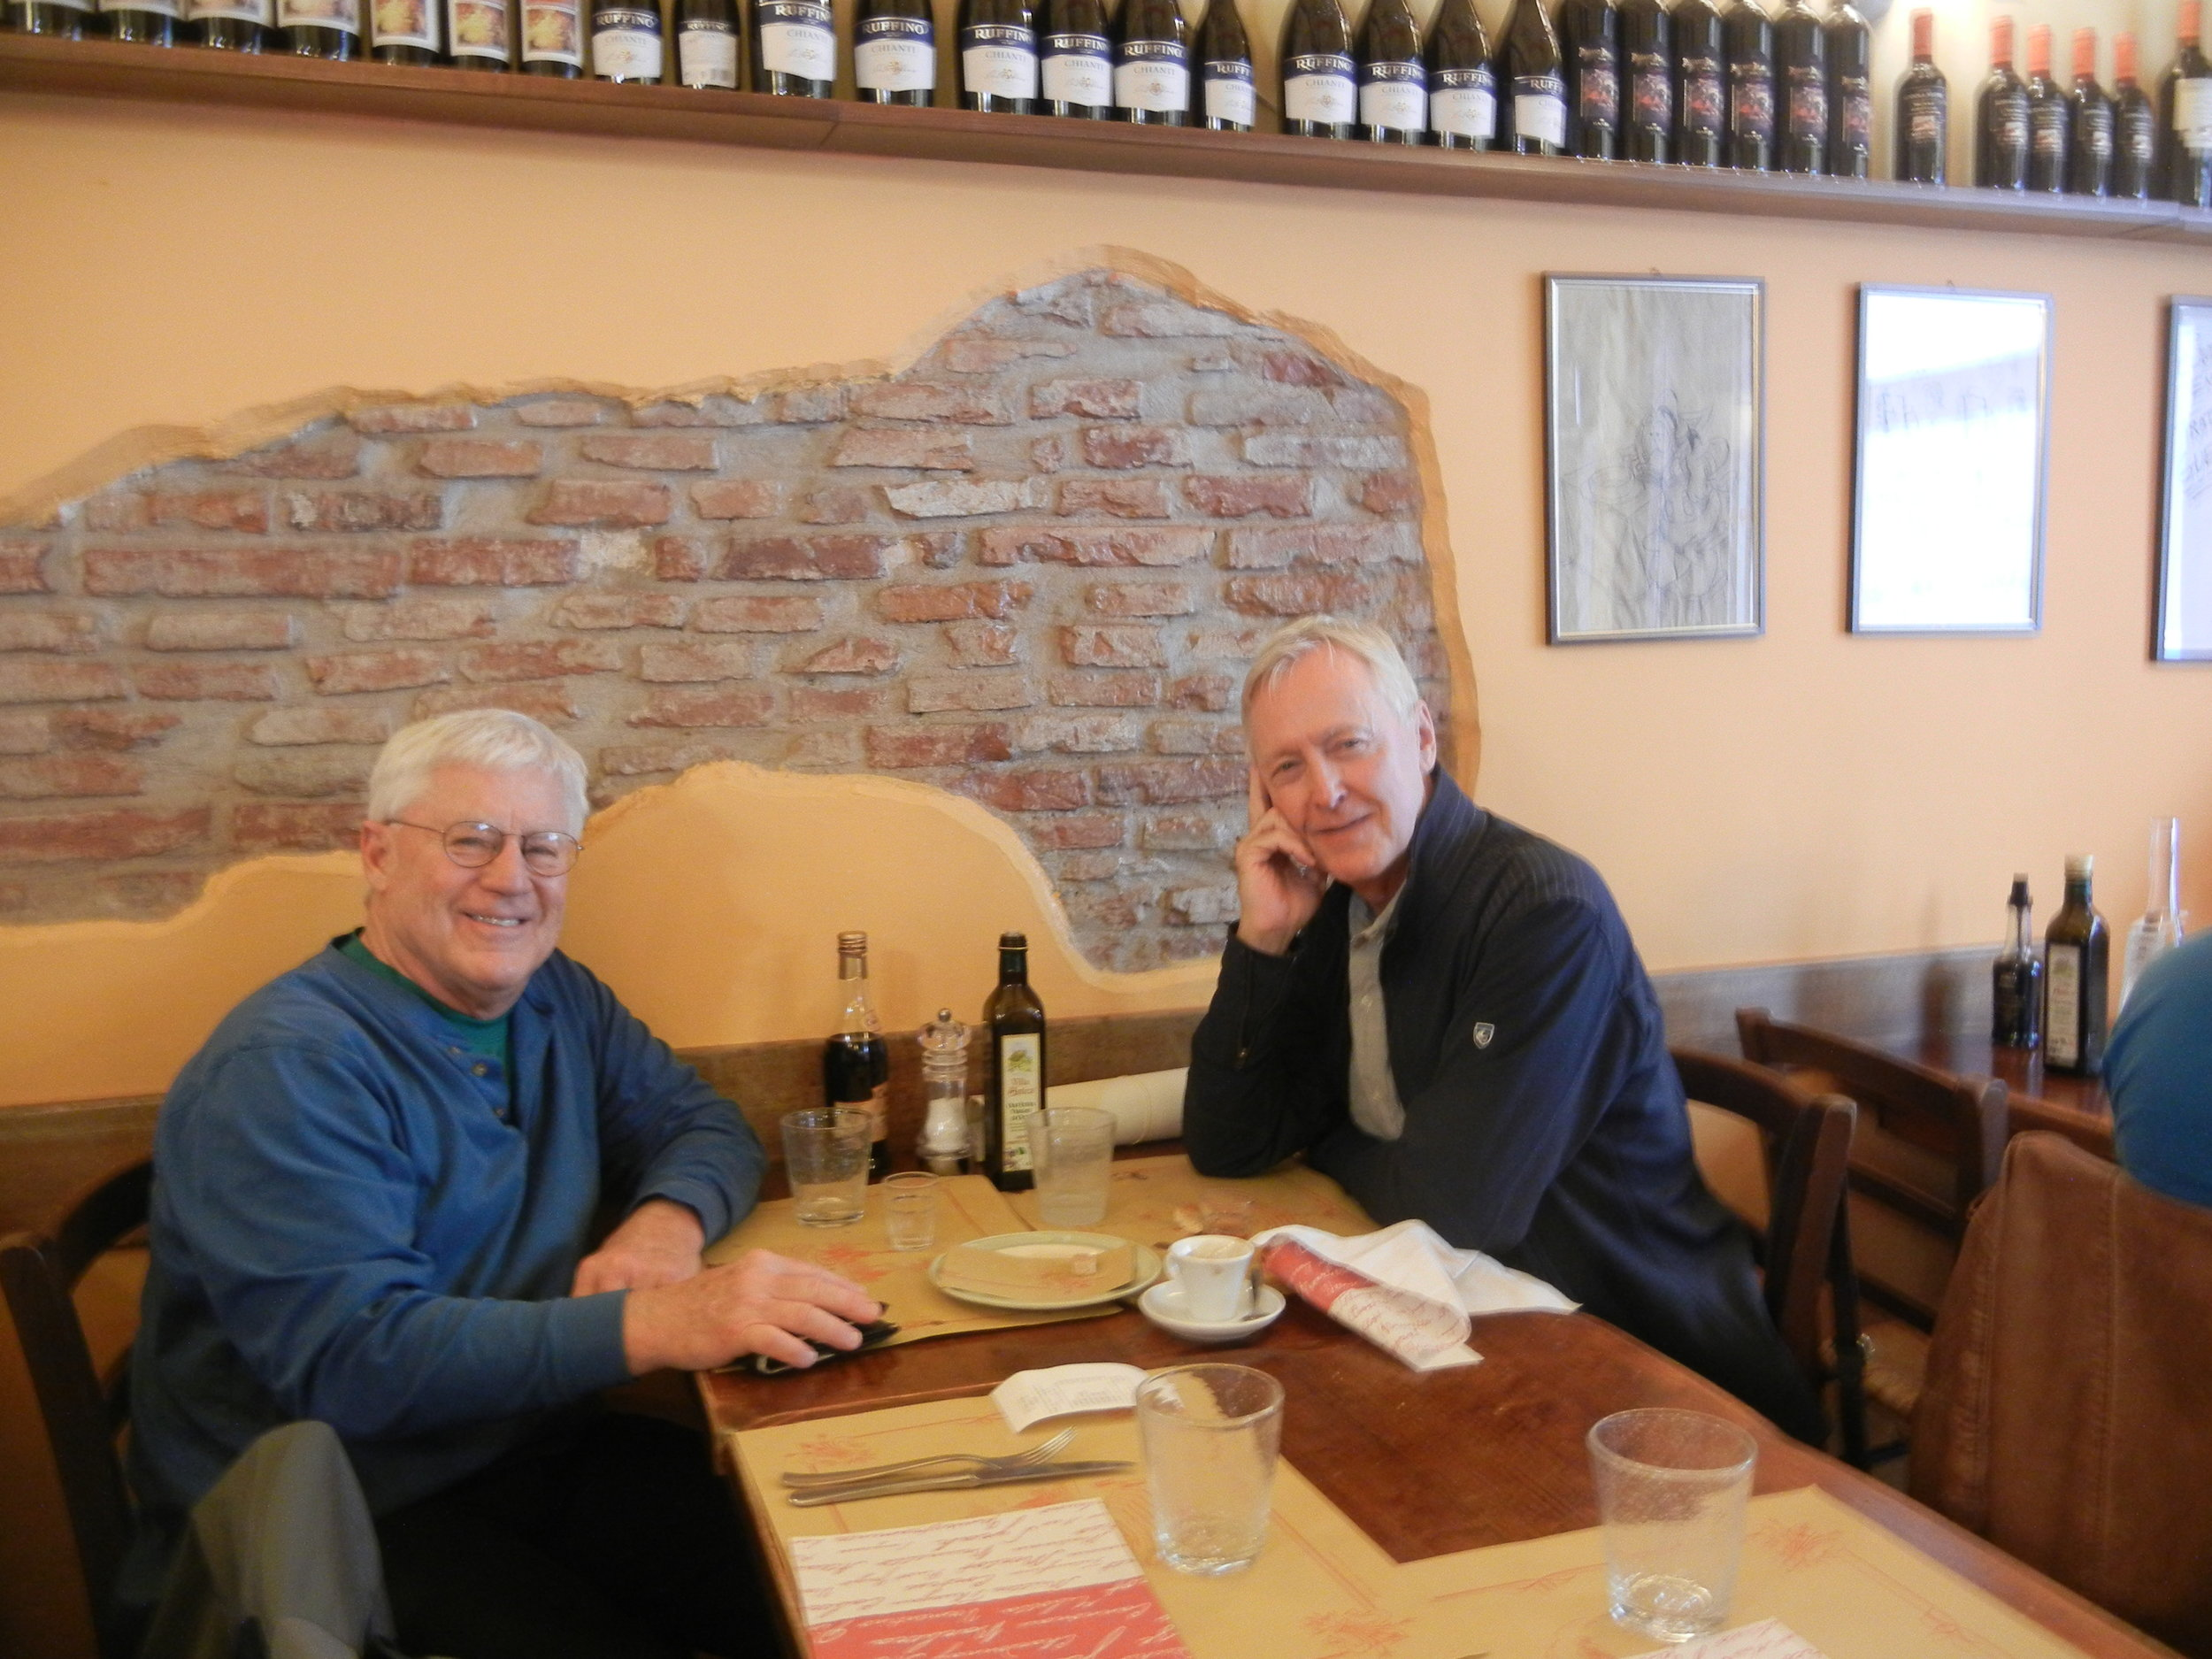 Rick Johnson with Scott Belville